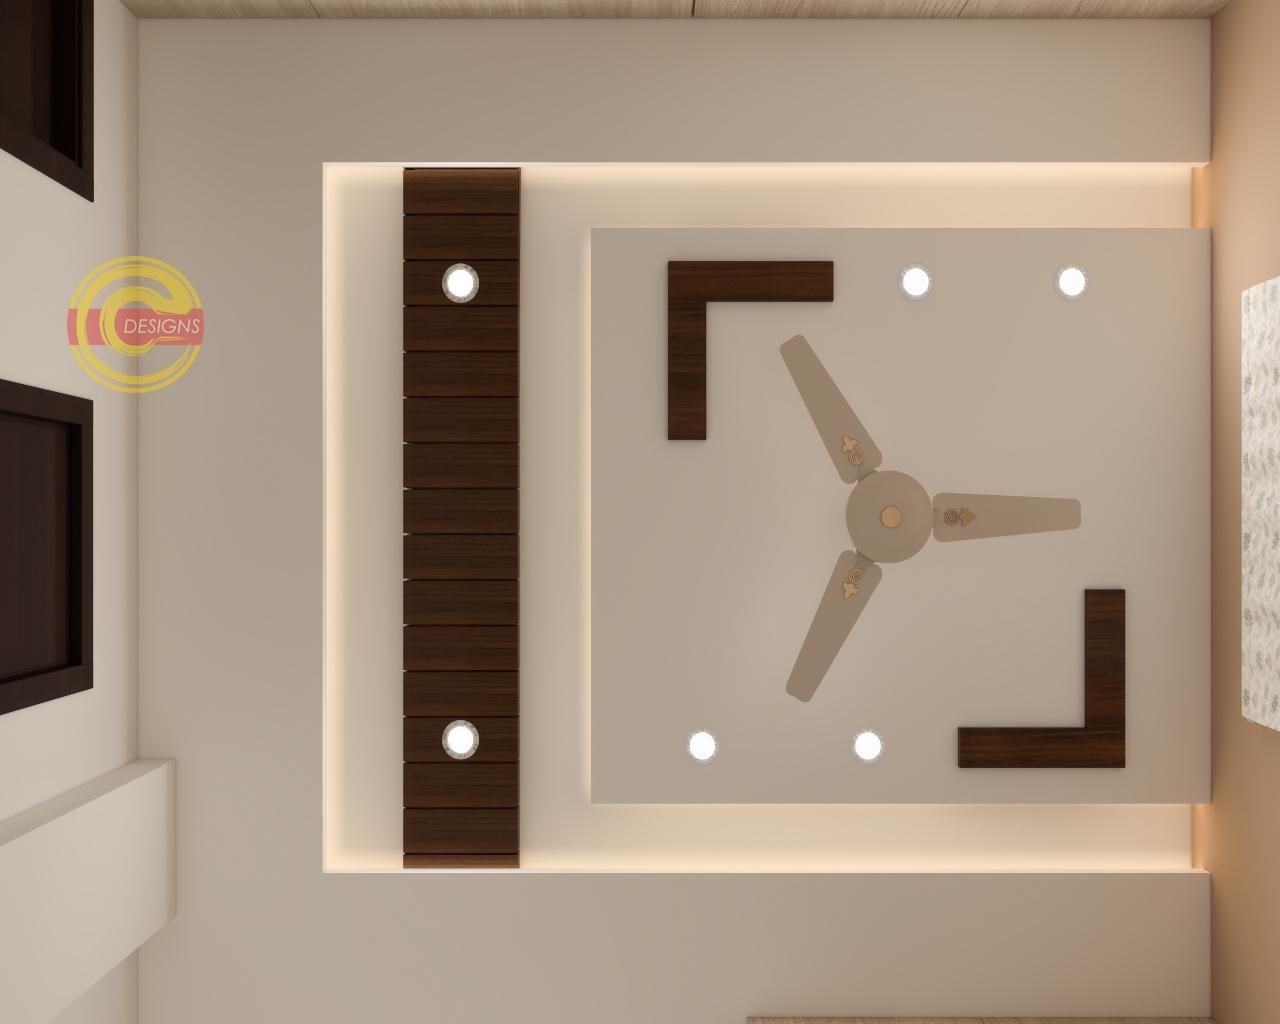 Linkedin Pop Ceiling Design Ceiling Design False Ceiling Design